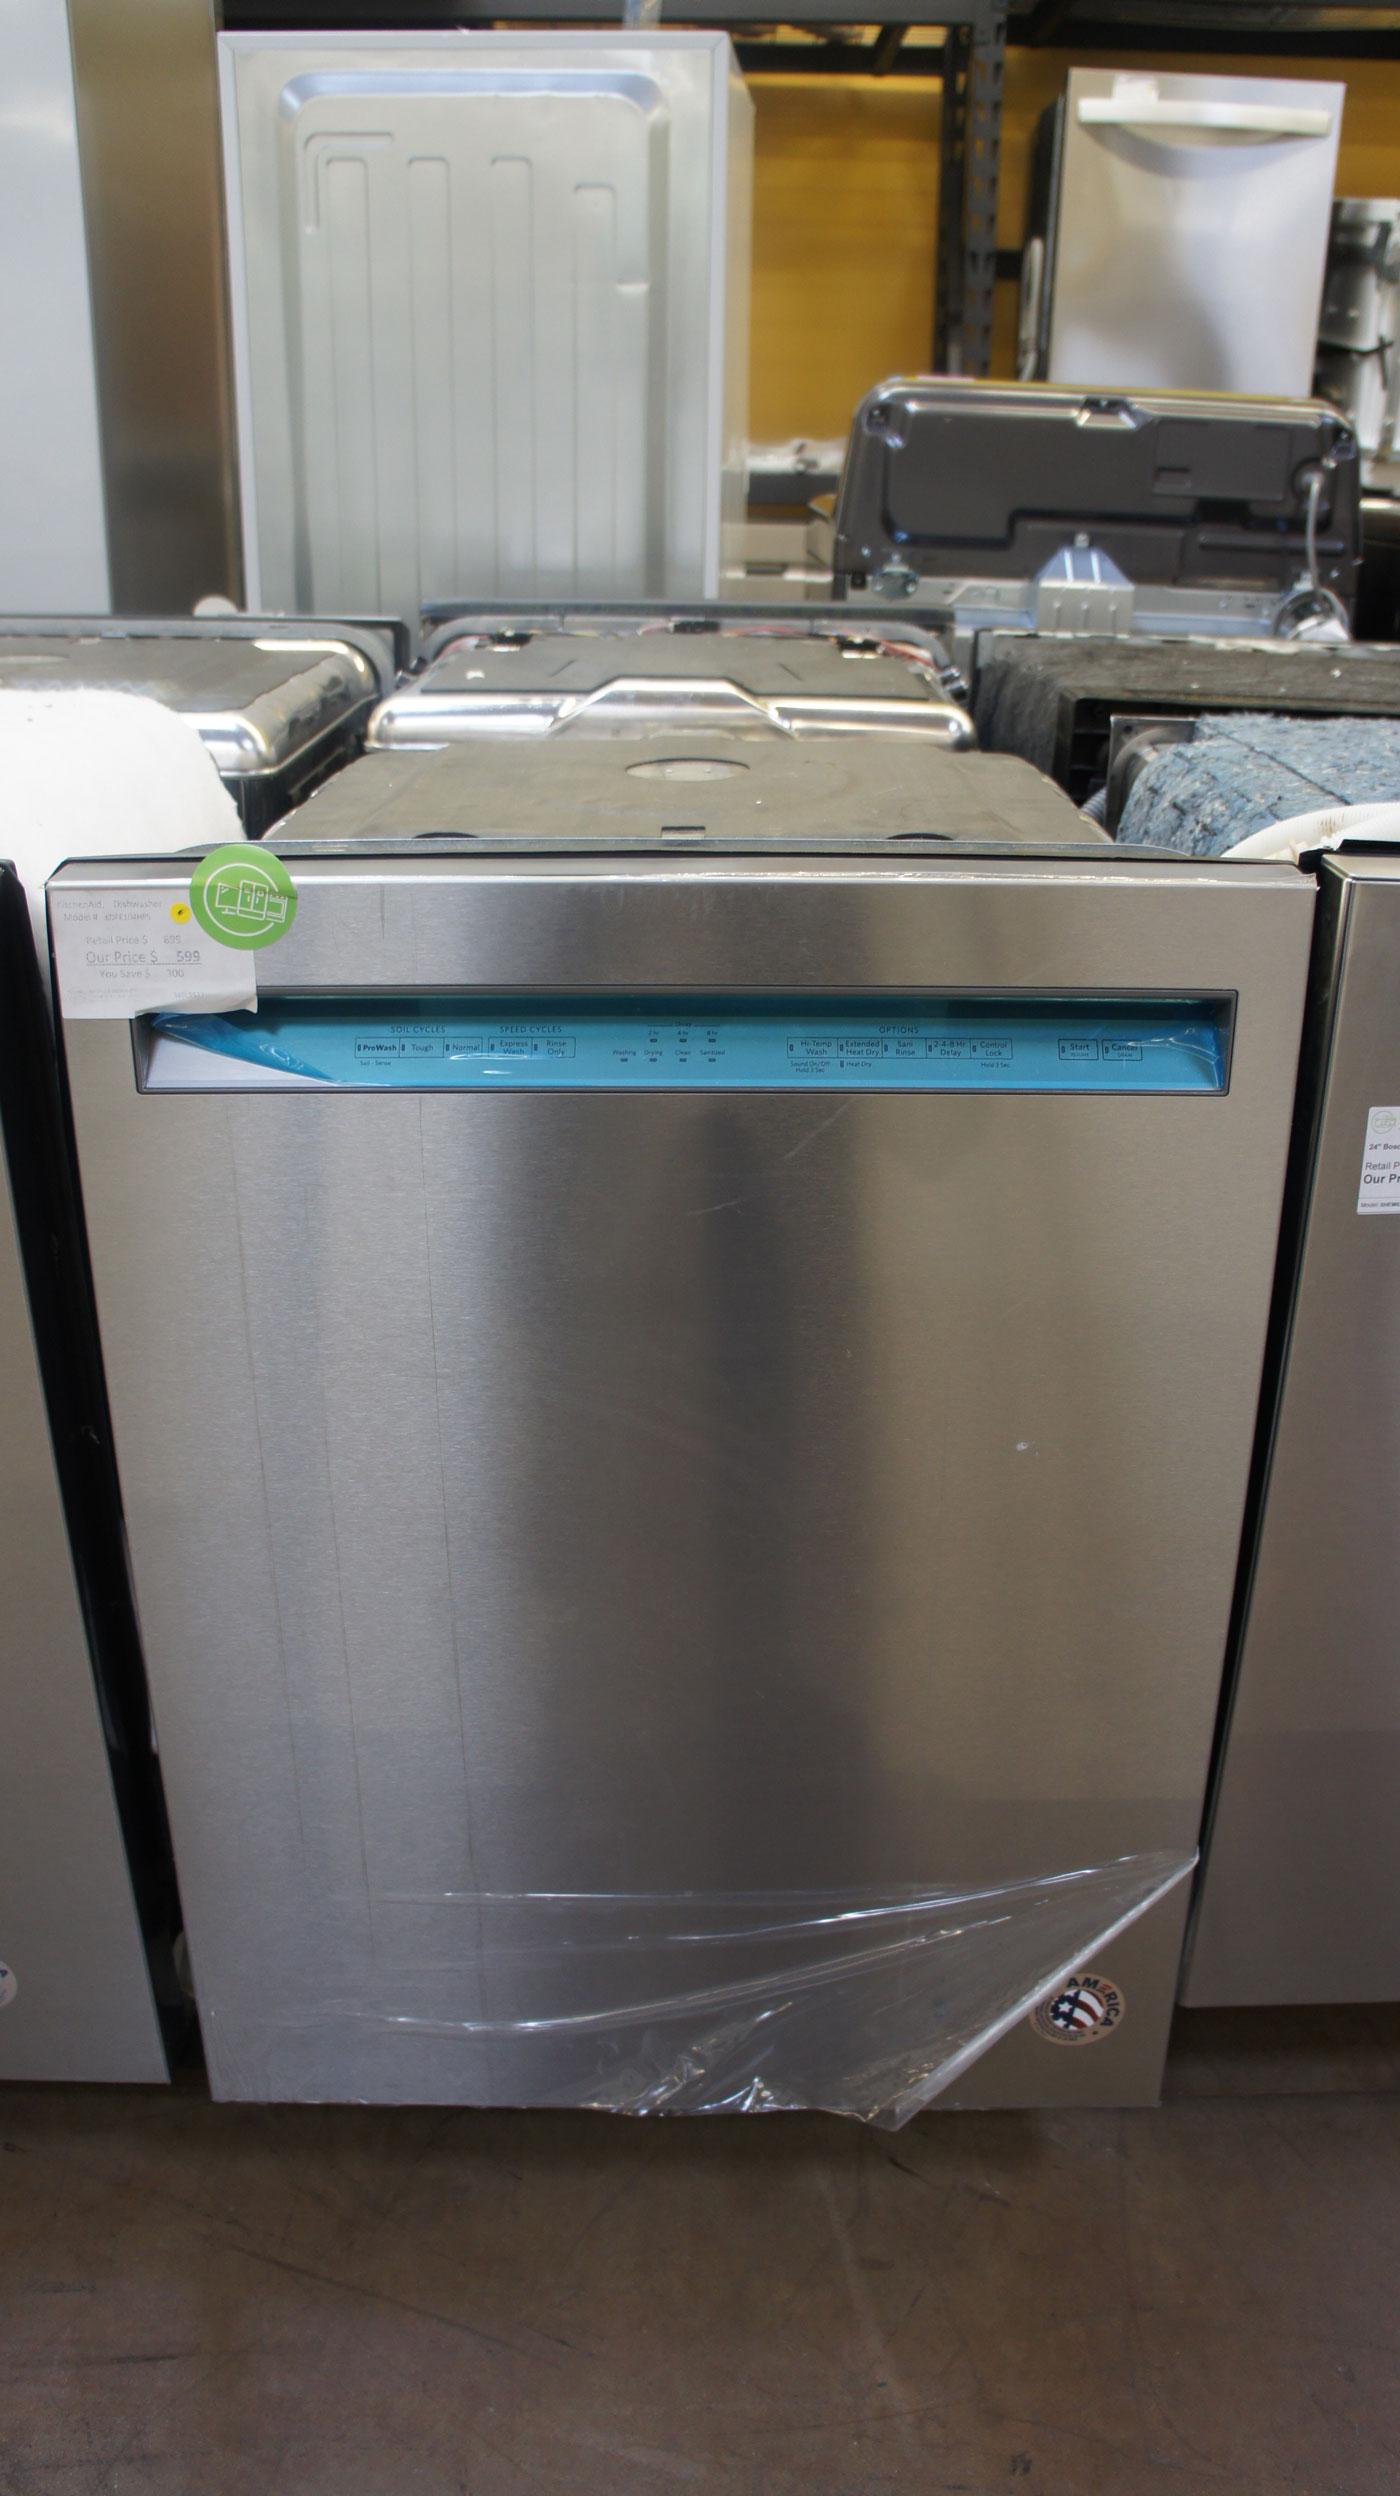 "24"" KitchenAid KDFE104HPS Built-In Dishwasher"